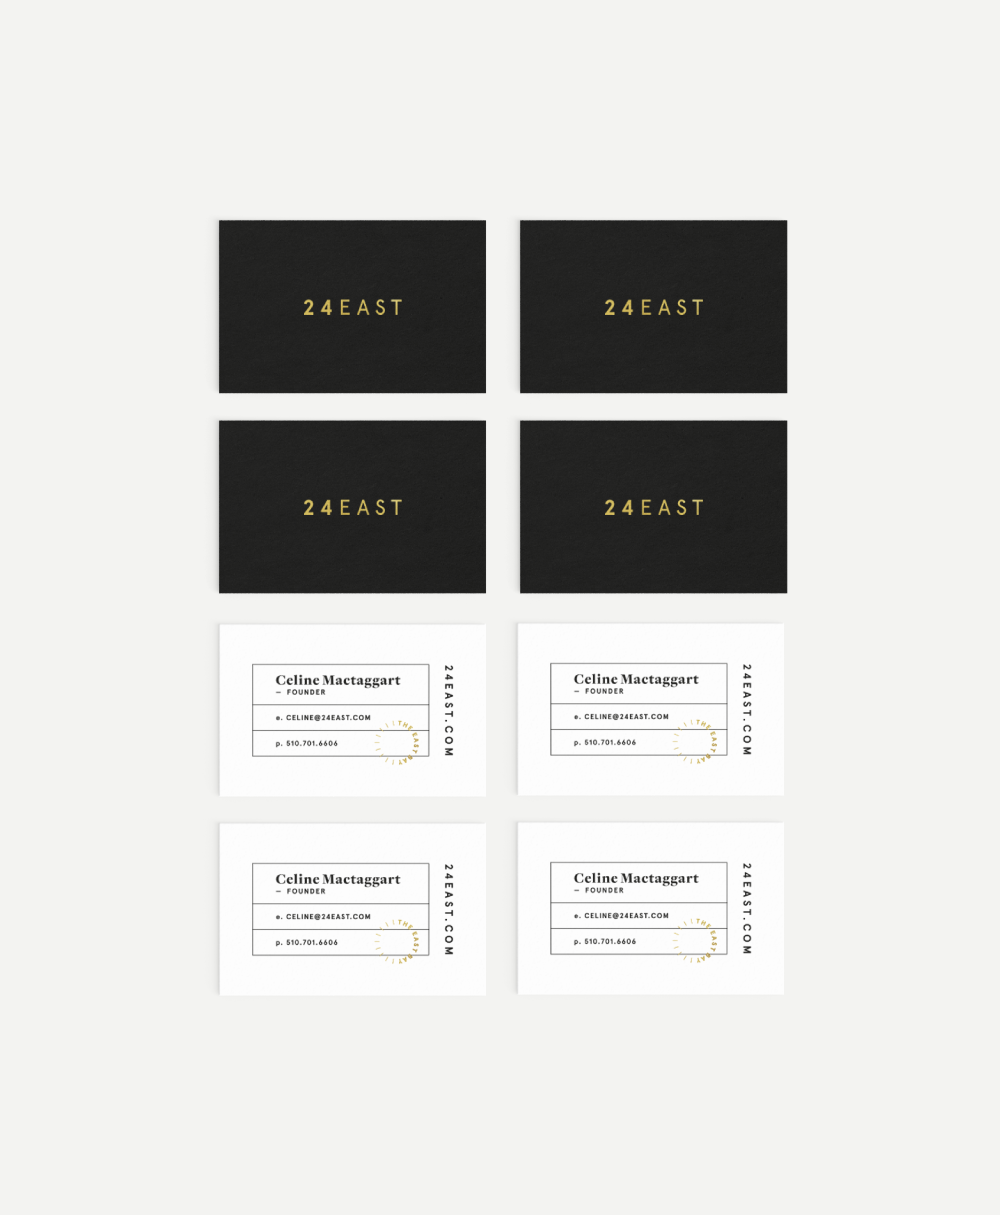 Pin by barbara gibiar on branding pinterest business cards business card design business cards print layout card designs logo branding letterpress rowan website designs print design reheart Choice Image